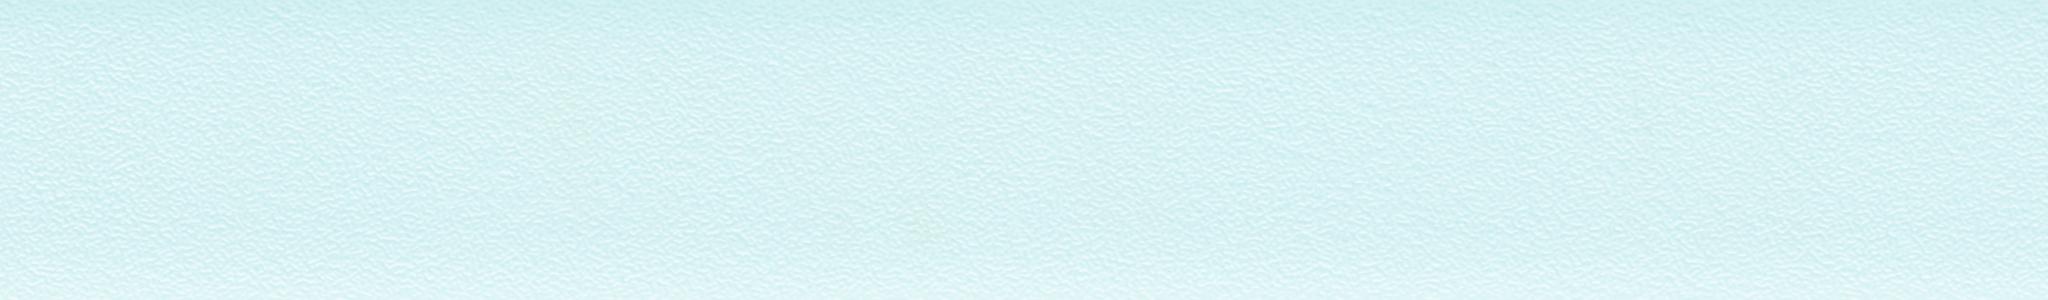 HU 15130 кромка ABS синяя светлая жемчуг 101